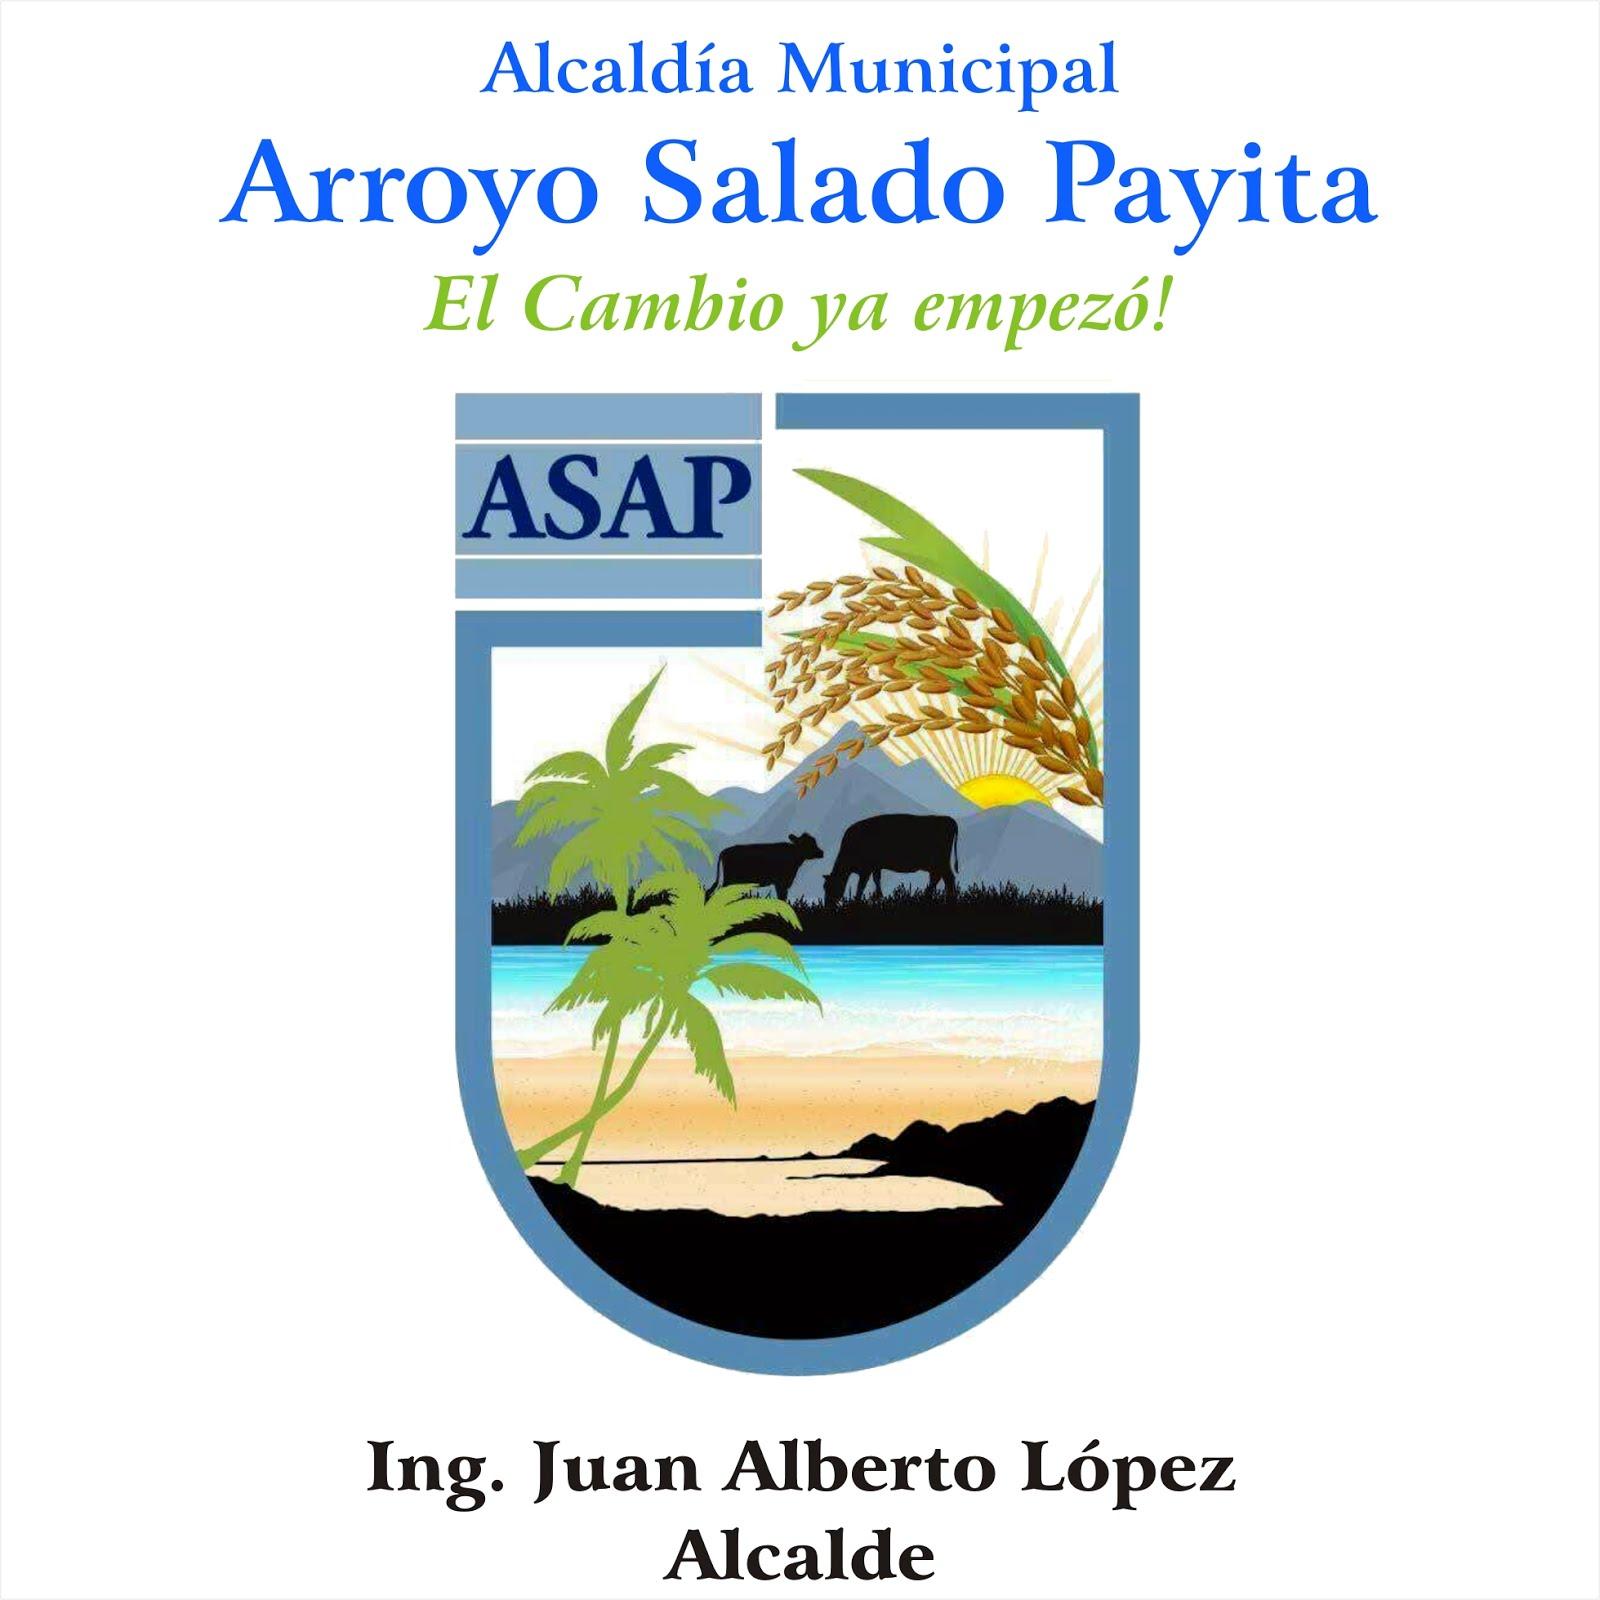 Alcadia Municipal Arroyo Salado Payita